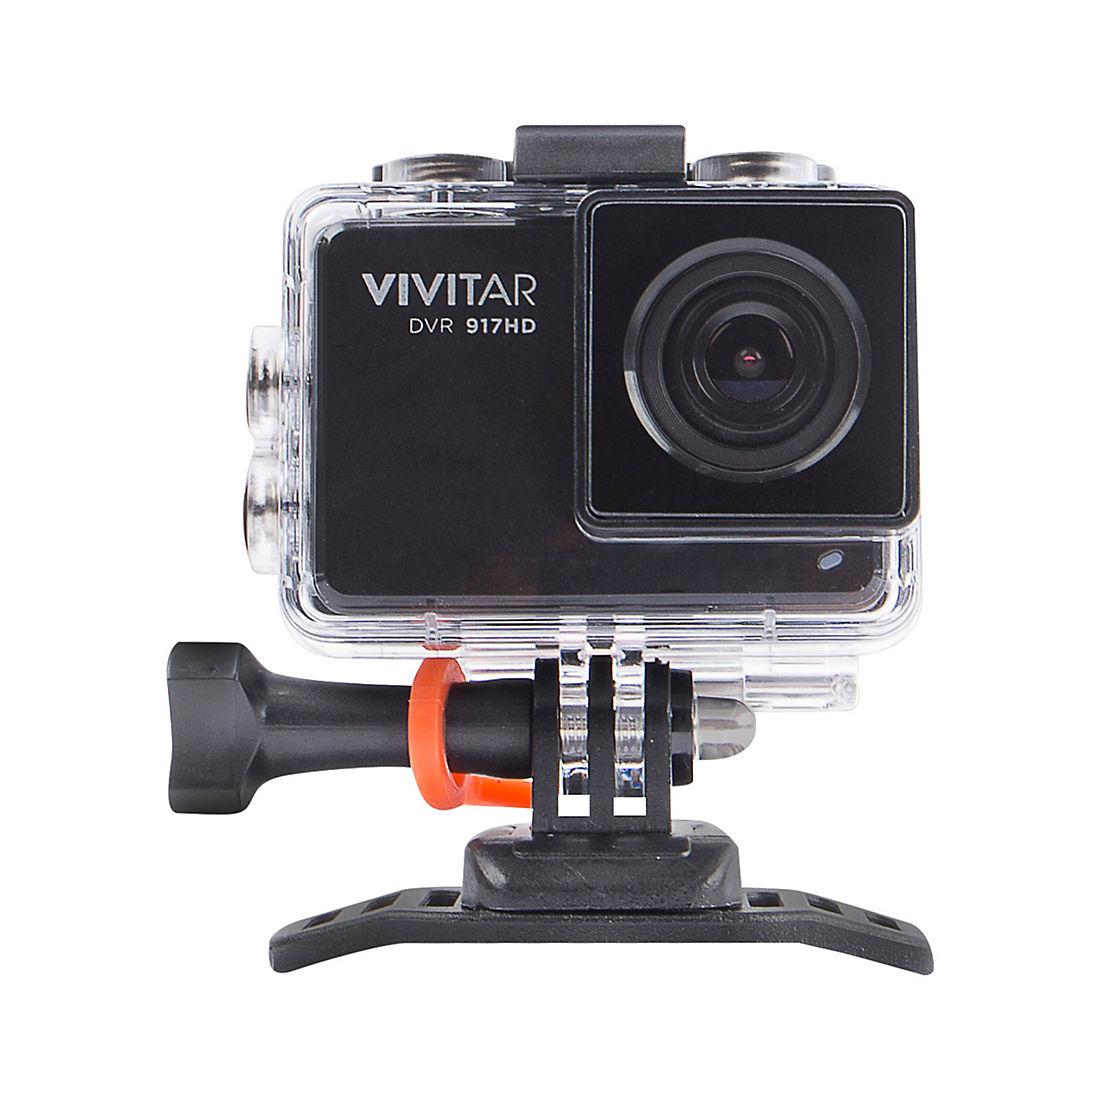 Vivitar's DVR917HD 16MP Waterproof Action Camera